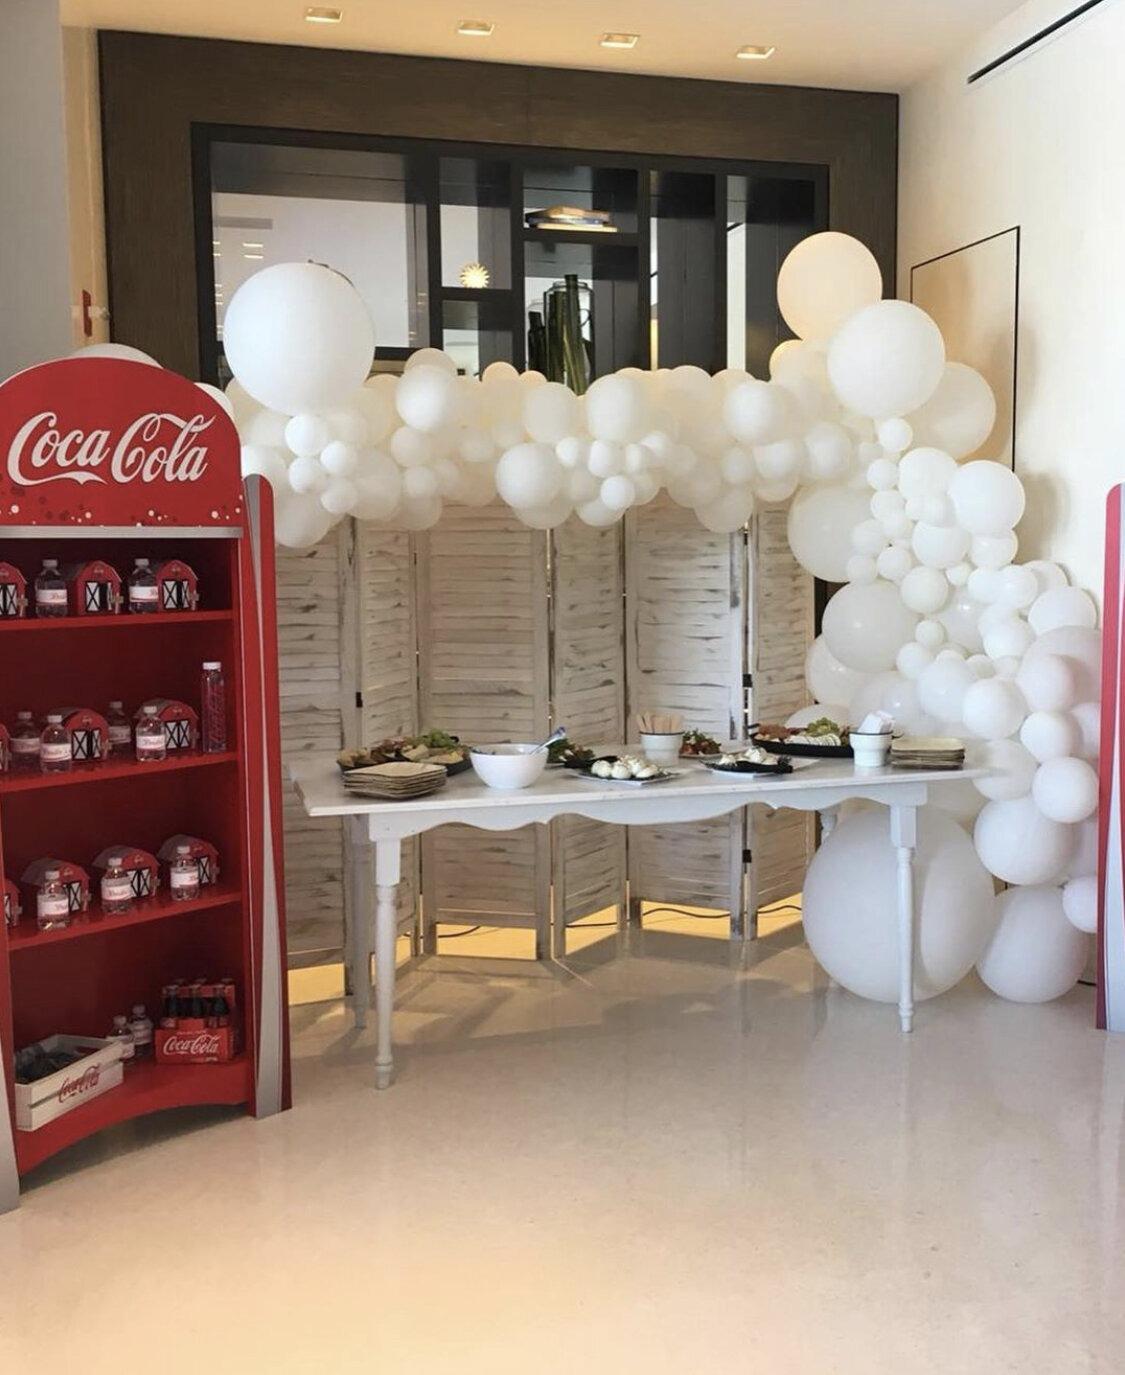 cocacola room decoration